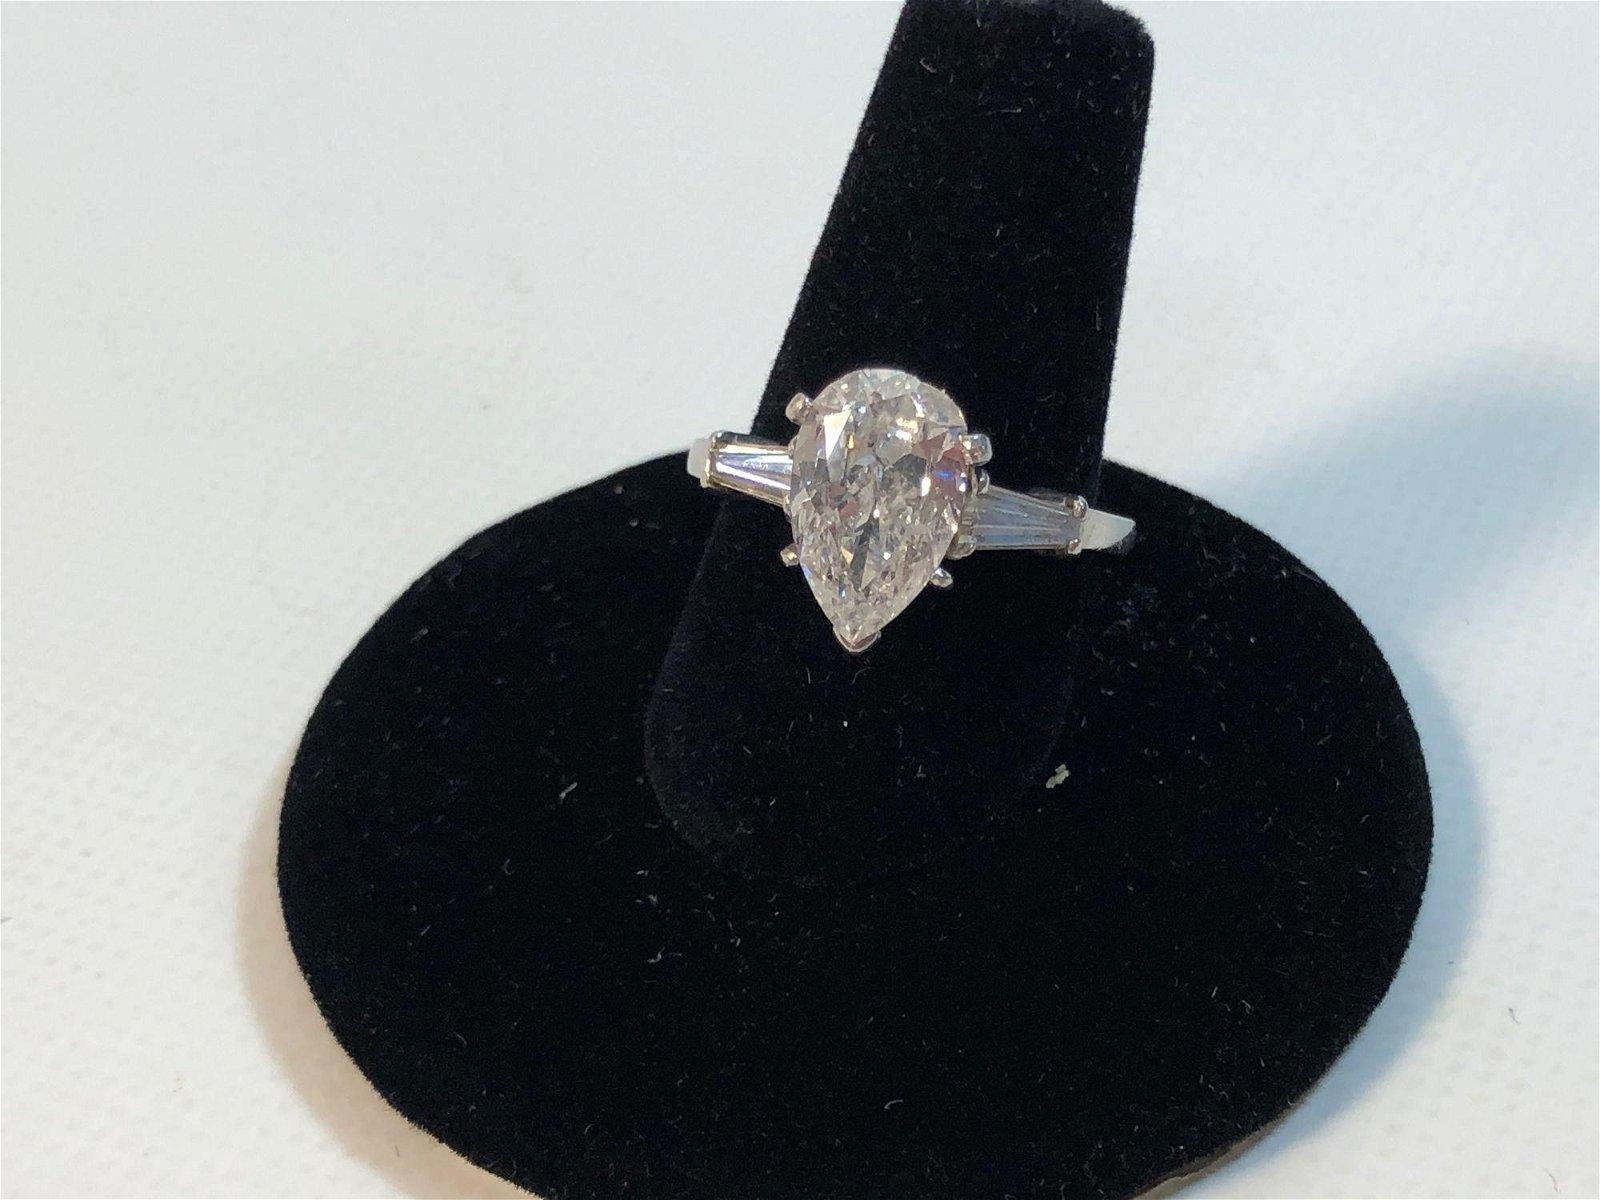 RING MOUNT WITH LOOSE DIAMOND ~ PEAR CUT DIAMOND 1